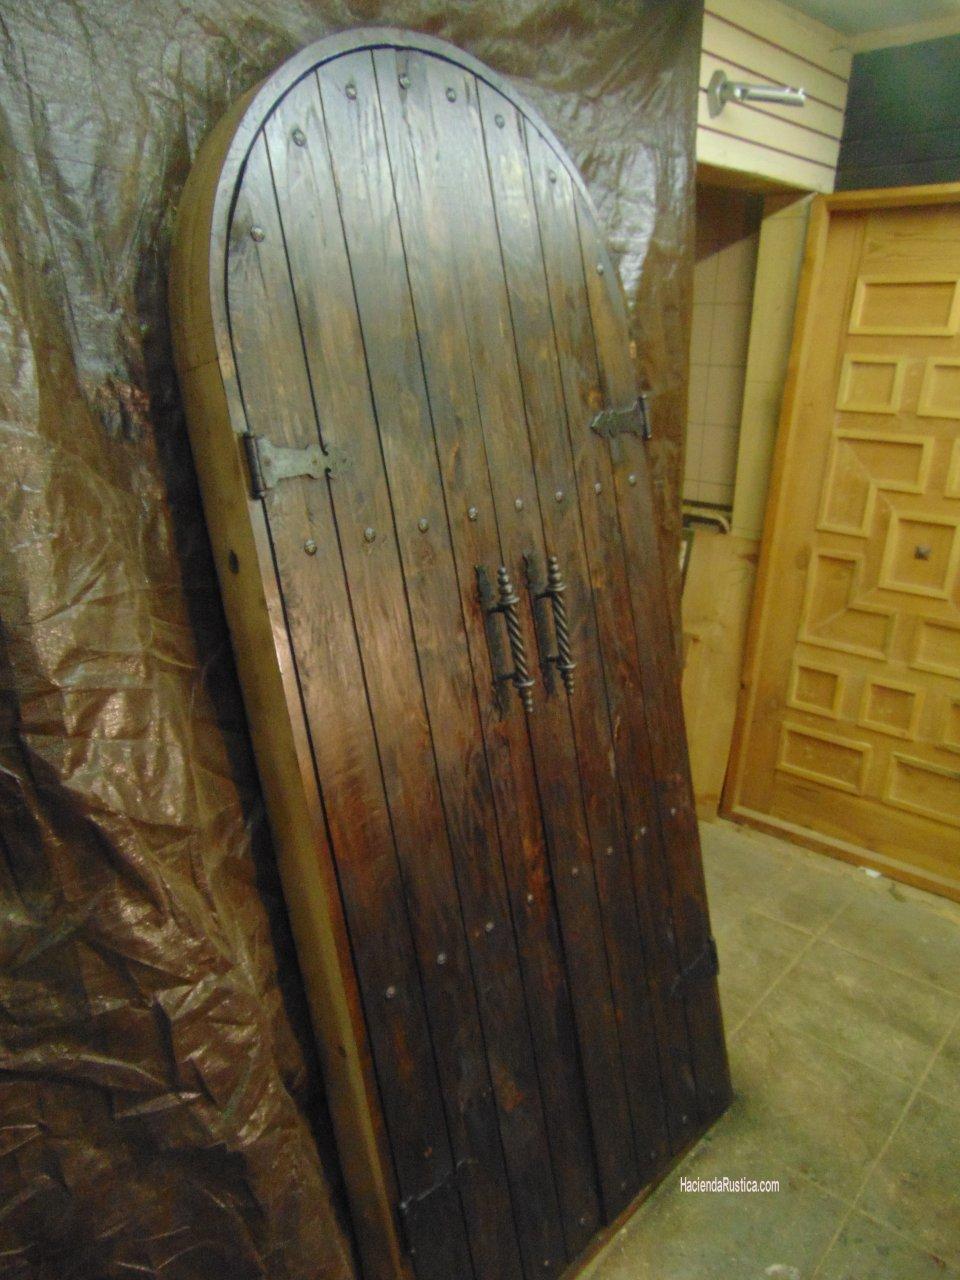 Arched alder rustic door